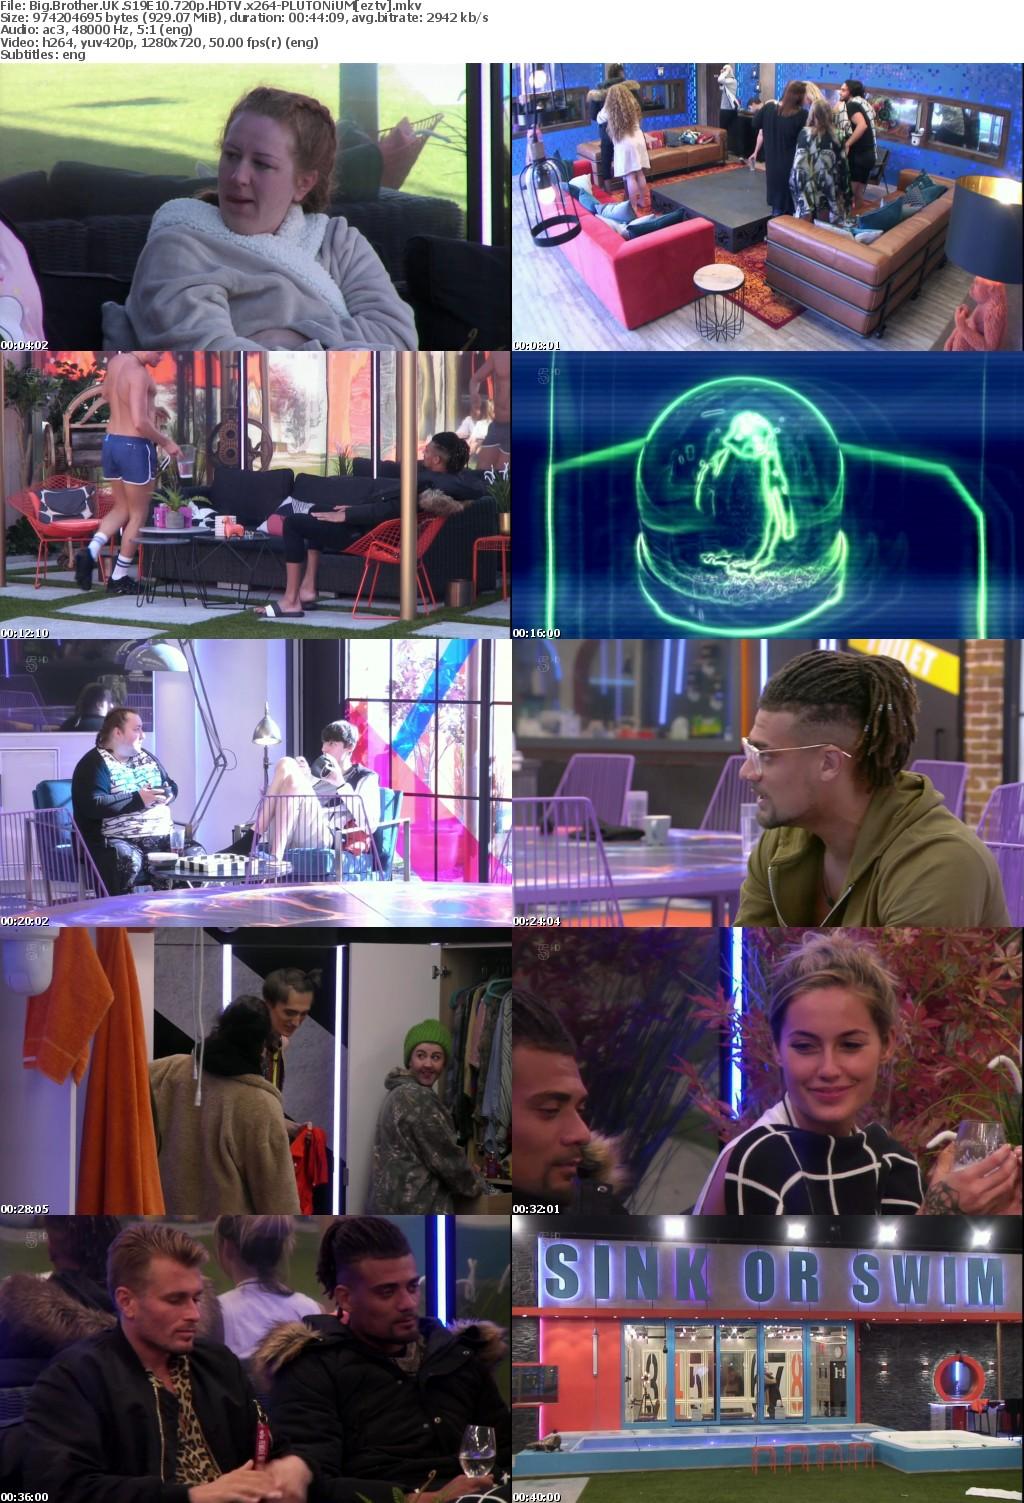 Big Brother UK S19E10 720p HDTV x264-PLUTONiUM